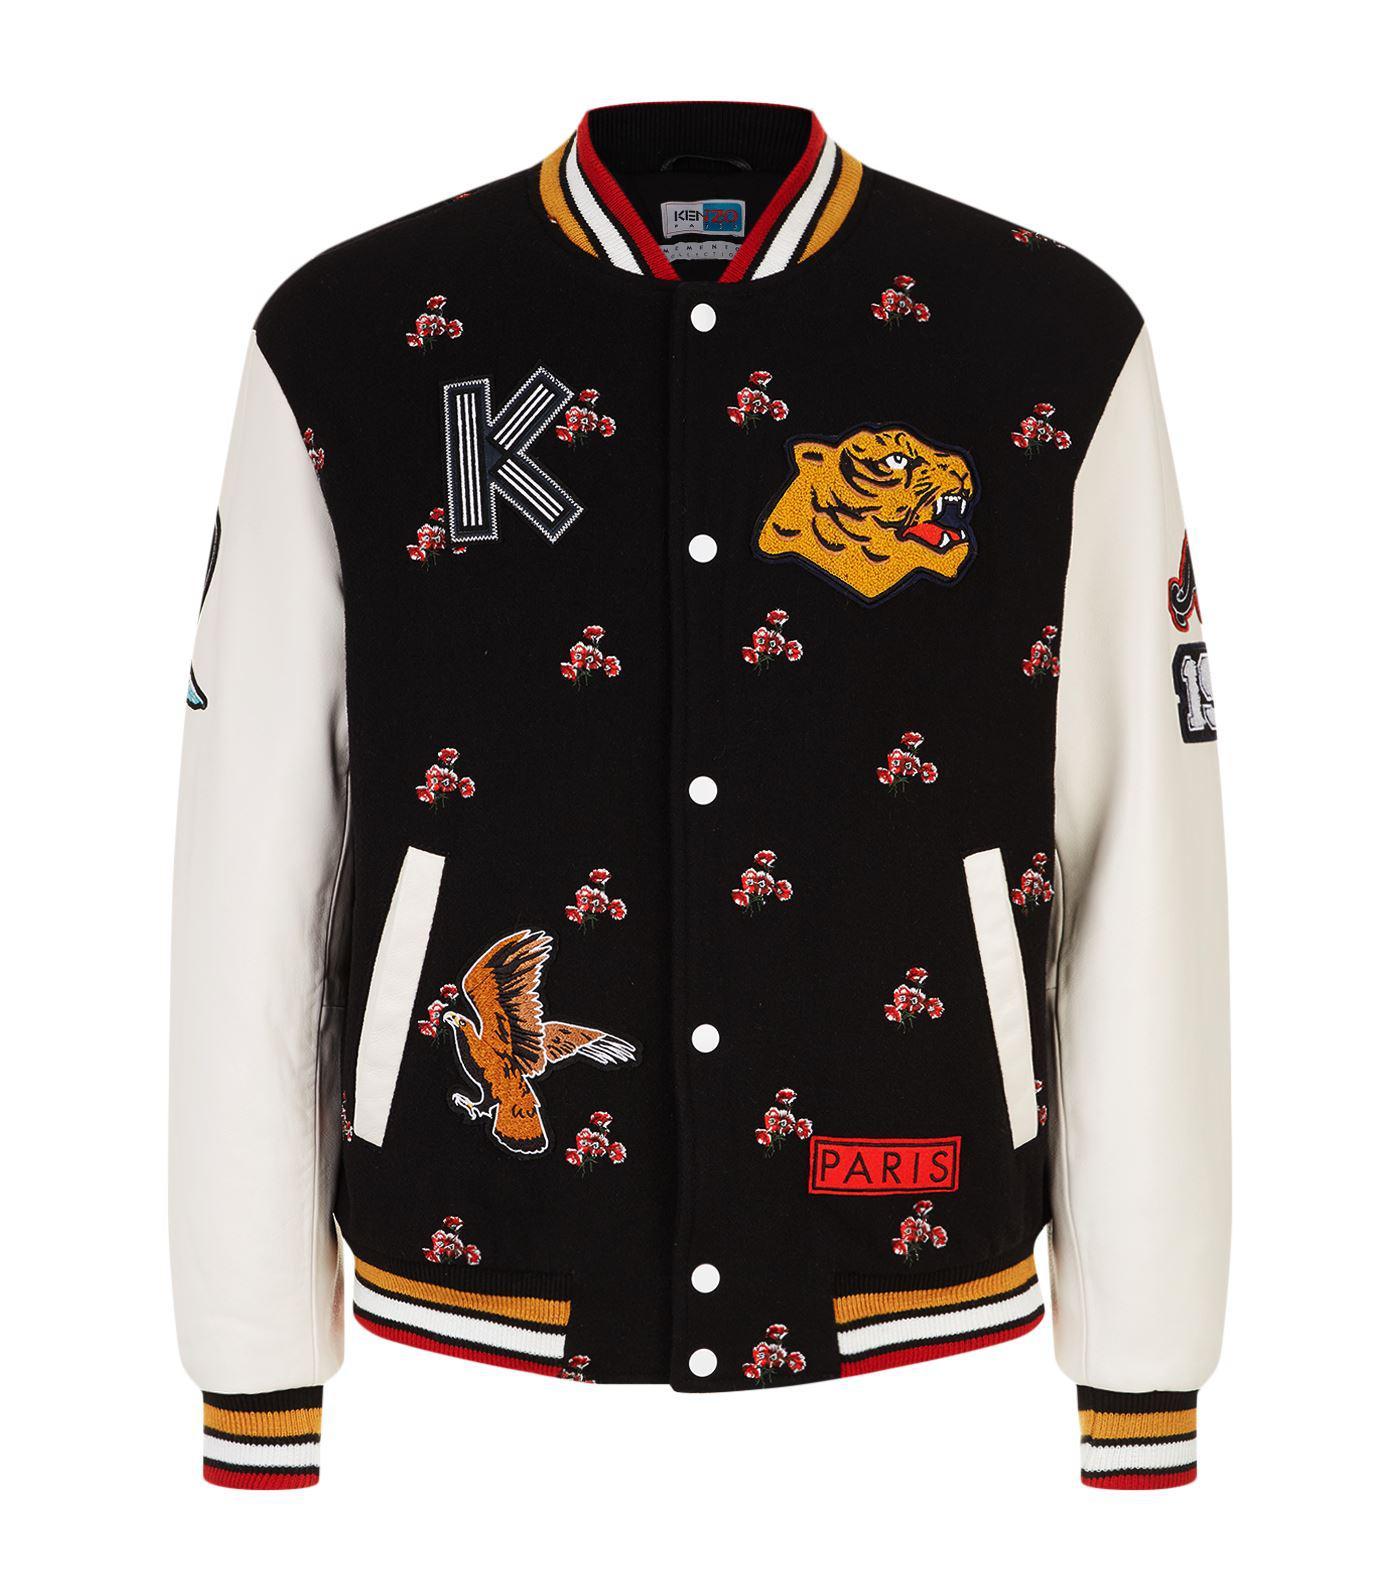 KENZO Cotton Floral Tiger Patch Varsity Jacket in Black for Men